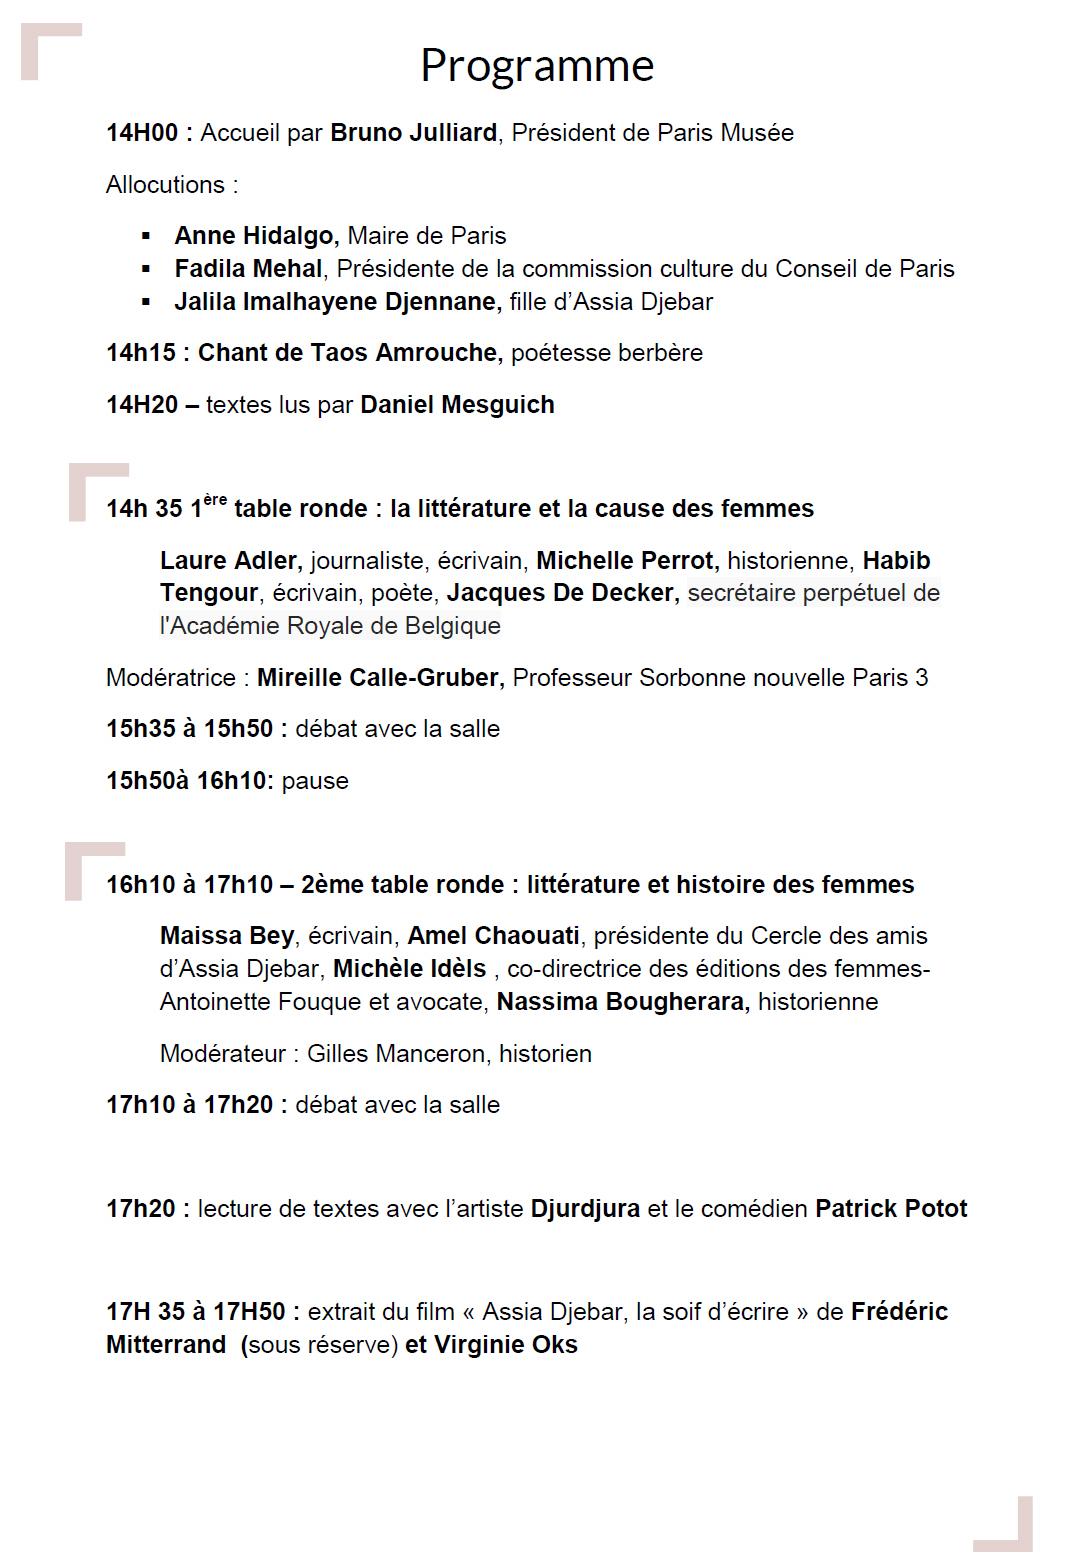 Programme-assia-djebar-page-2